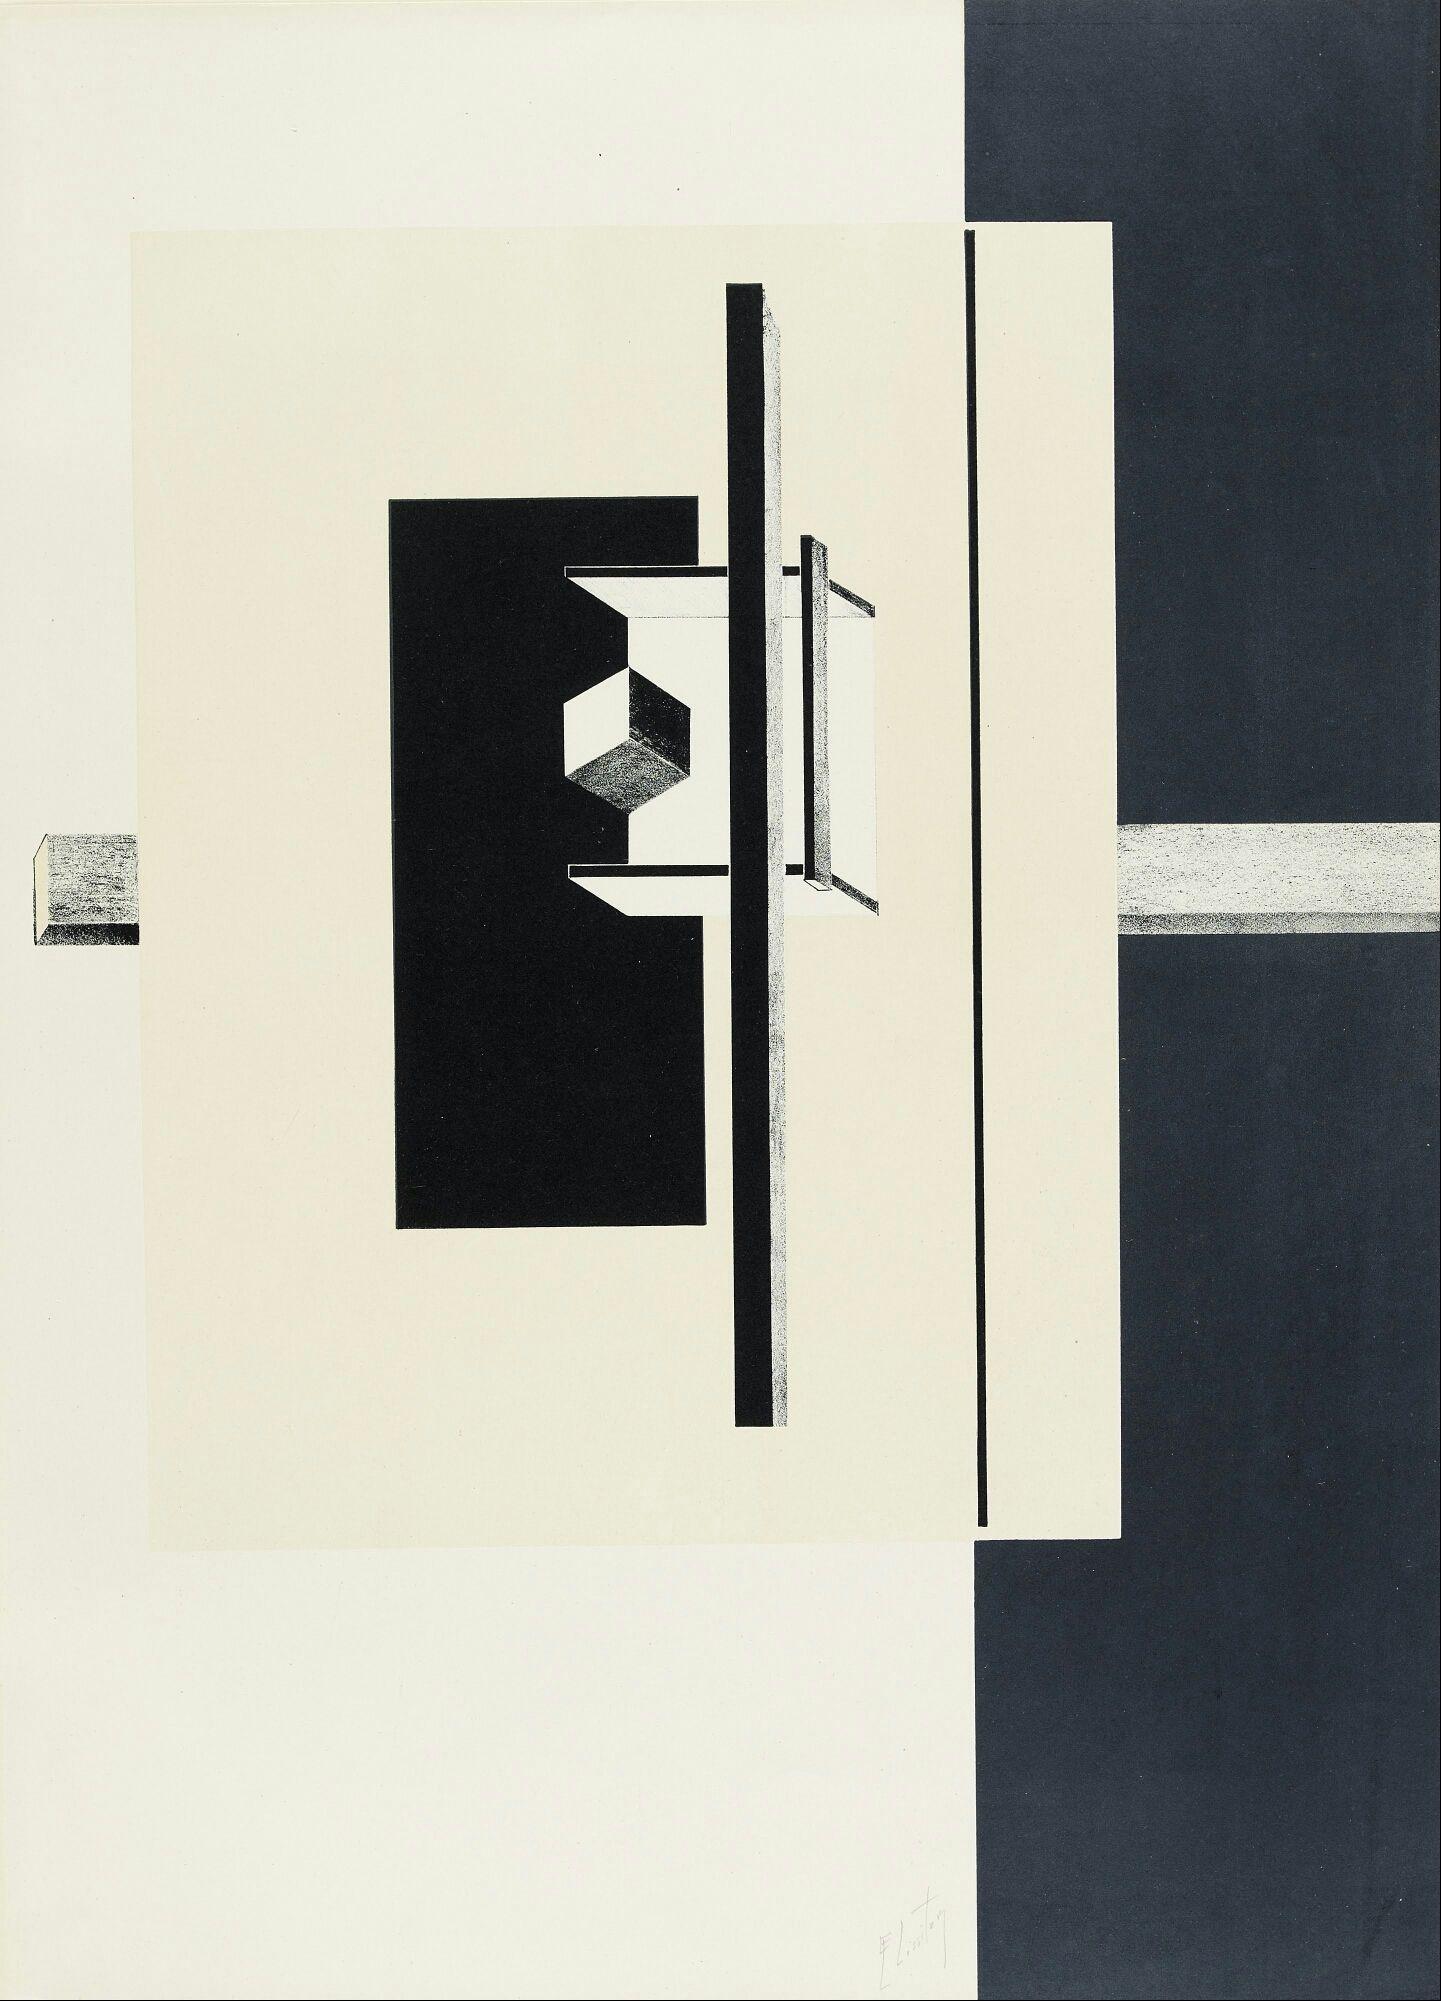 El Lissitzky, 절대주의 /  좌우 흑과백의 대비, 포지티브 네거티브가 명확하여 강한 인상을 주었습니다. 큰 면적 요소로 다소 단순해 보일 수 있는 구성을 가운데의 디테일 한 요소들로 보완 할 수 있을 것 같아 선택했습니다. 입체적 요소와 평면적 요소를 적절히 사용하여 재미있는 구성을 해 볼 수 있을 것 같습니다.